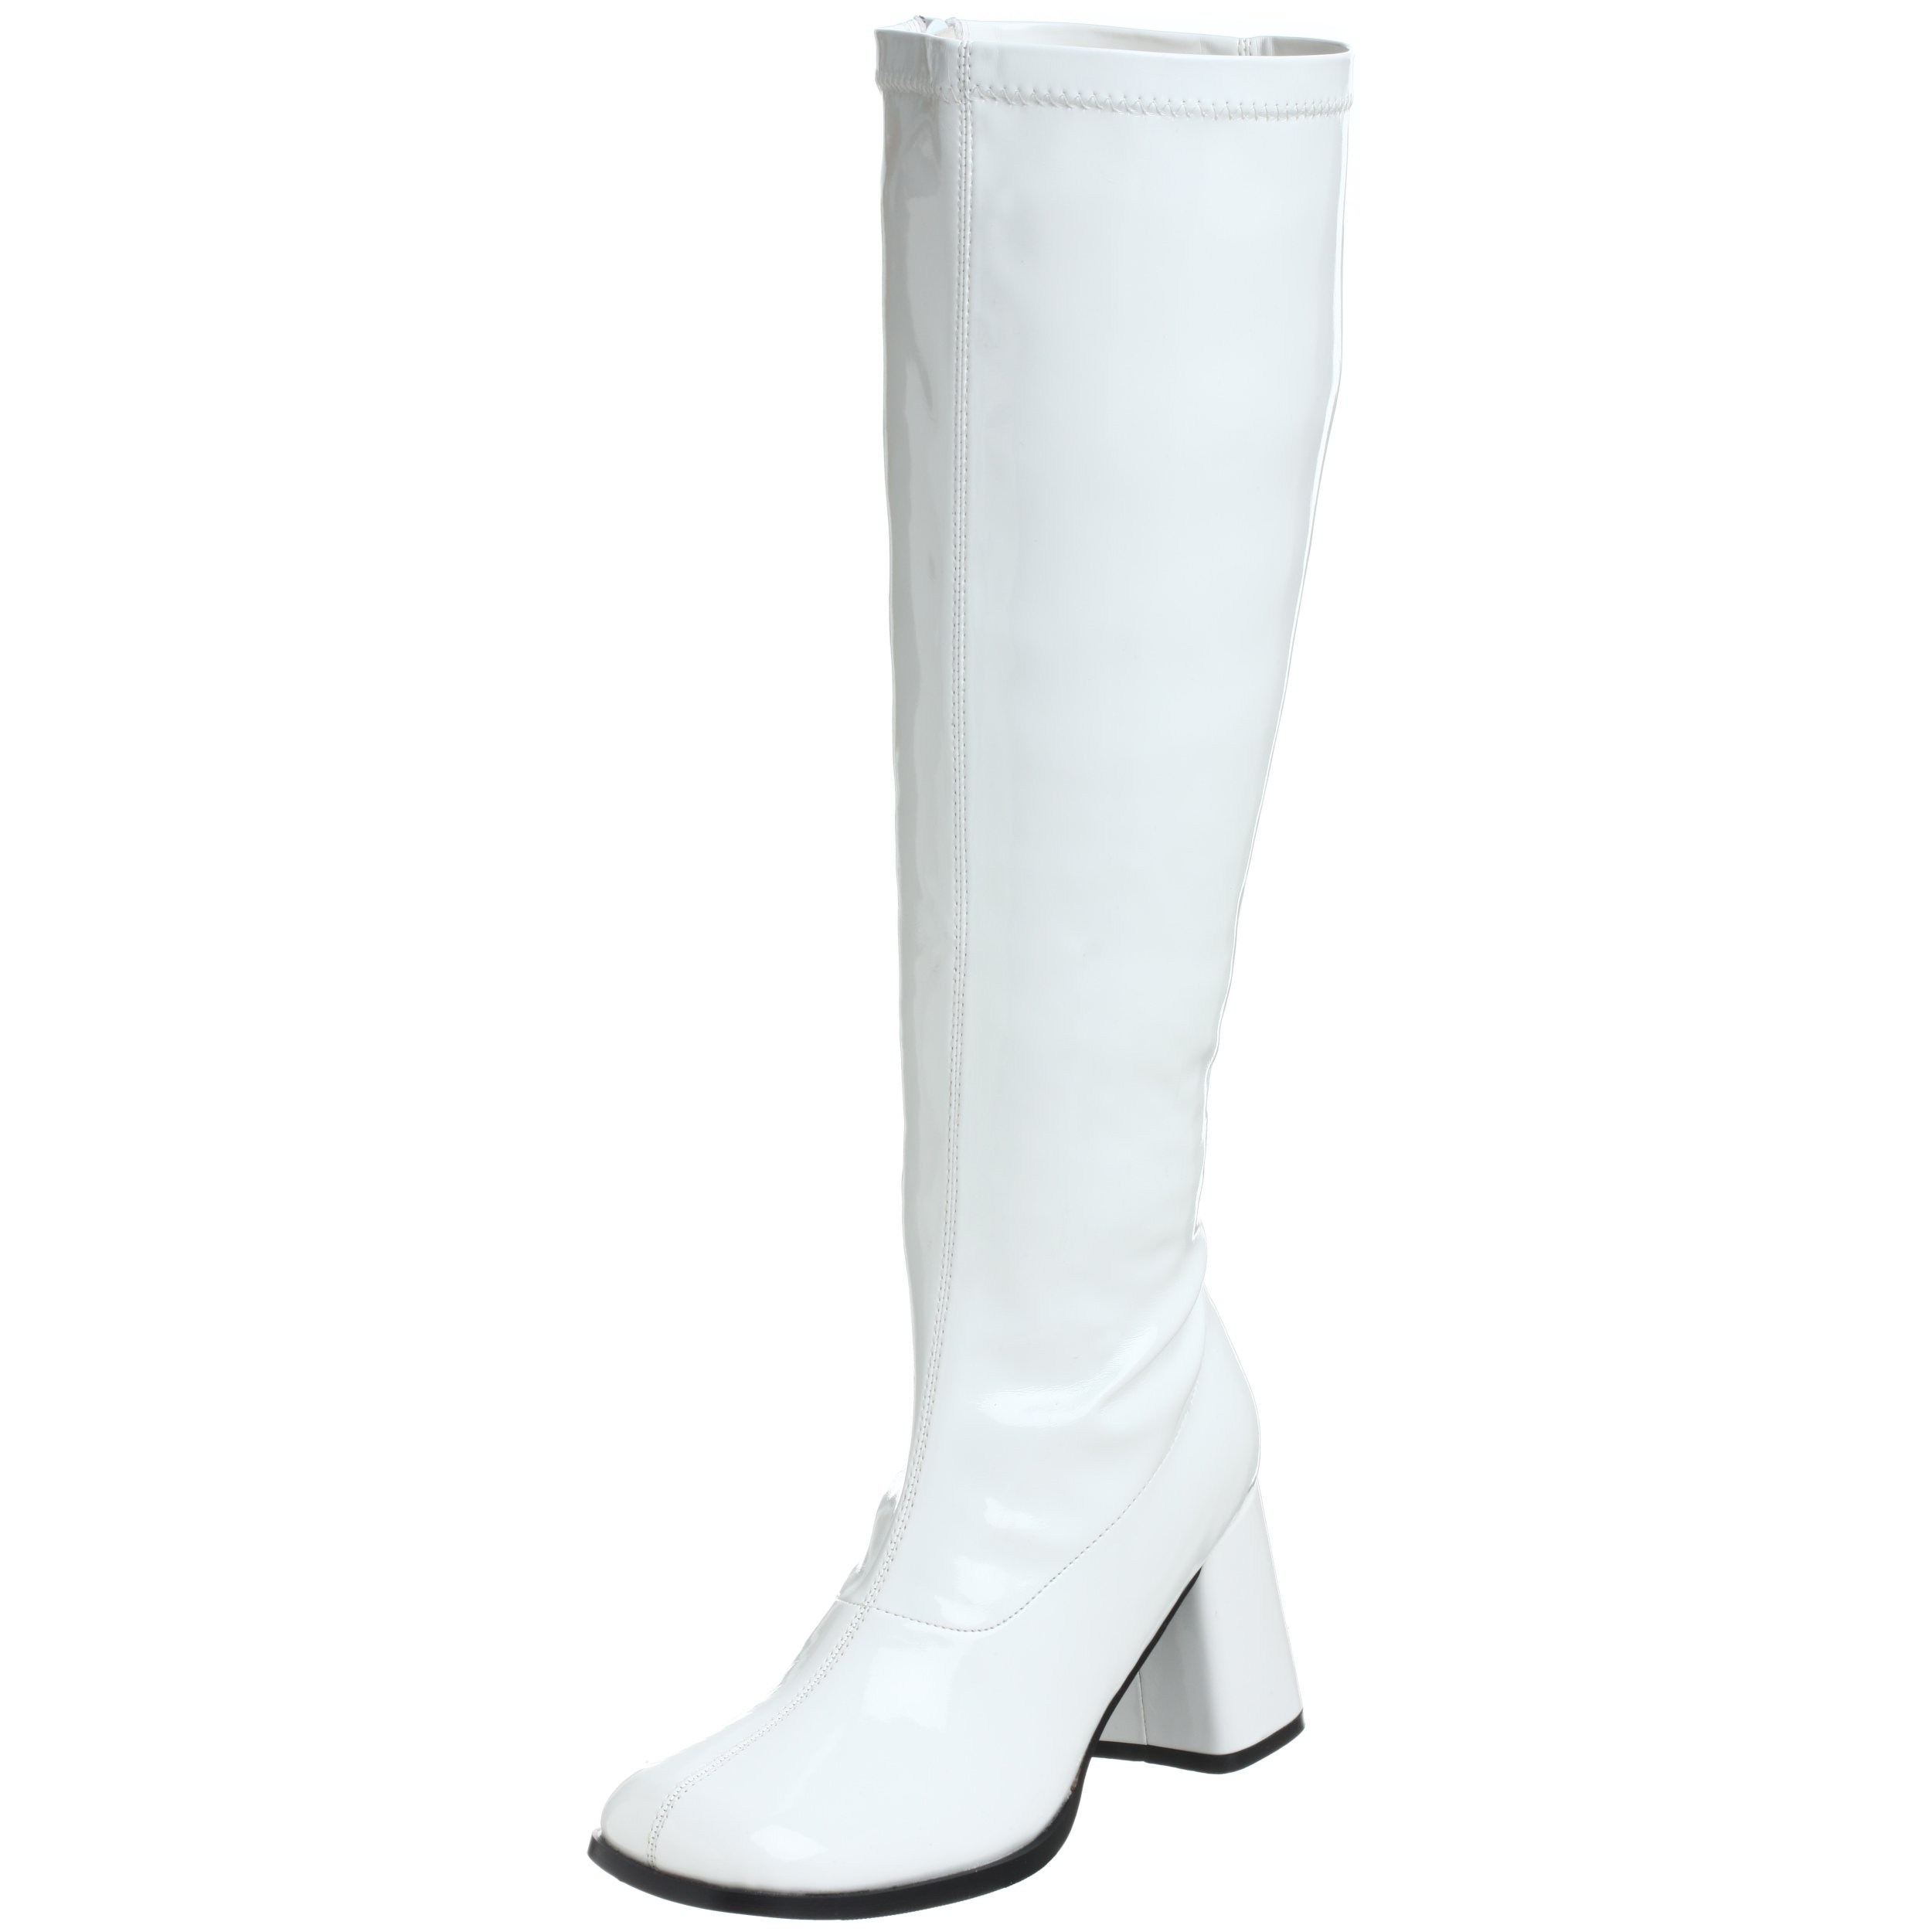 463c8bb51fd9 Best Rated in Women s Costume Footwear   Helpful Customer Reviews ...